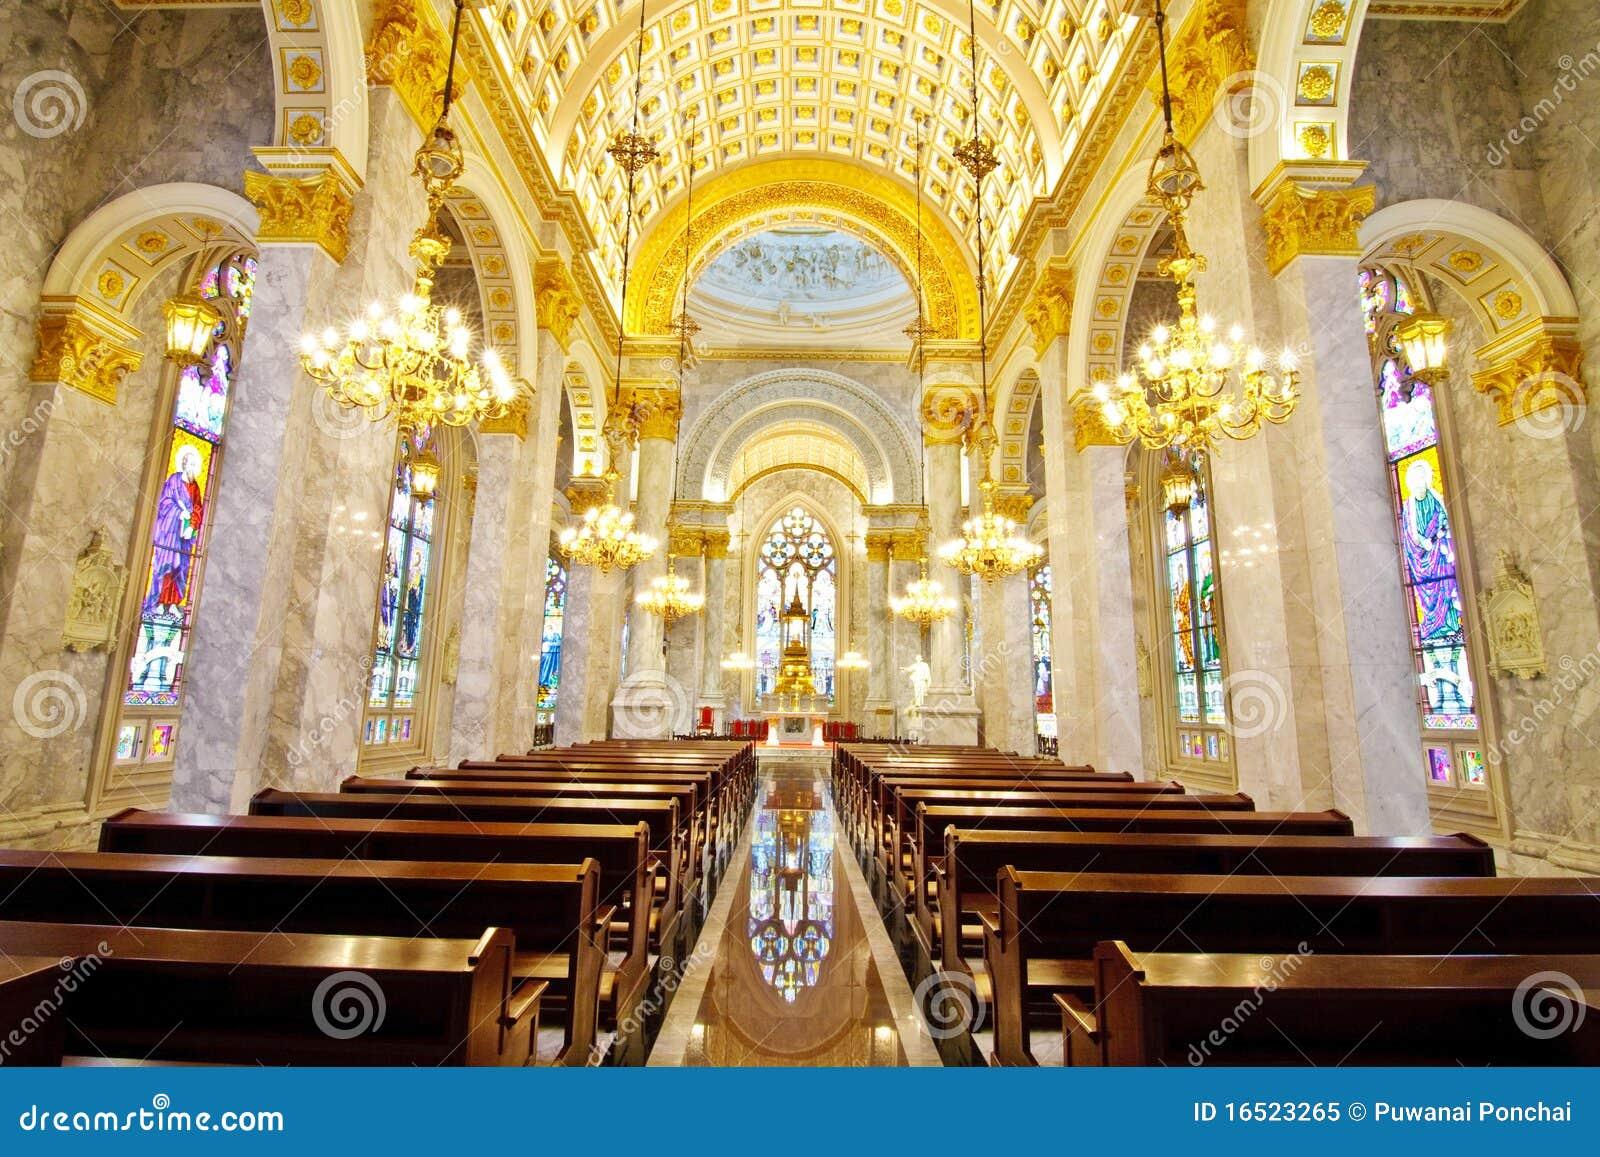 Interior dentro de una iglesia cat lica foto de archivo libre de regal as imagen 16523265 - Foto foto interior ...